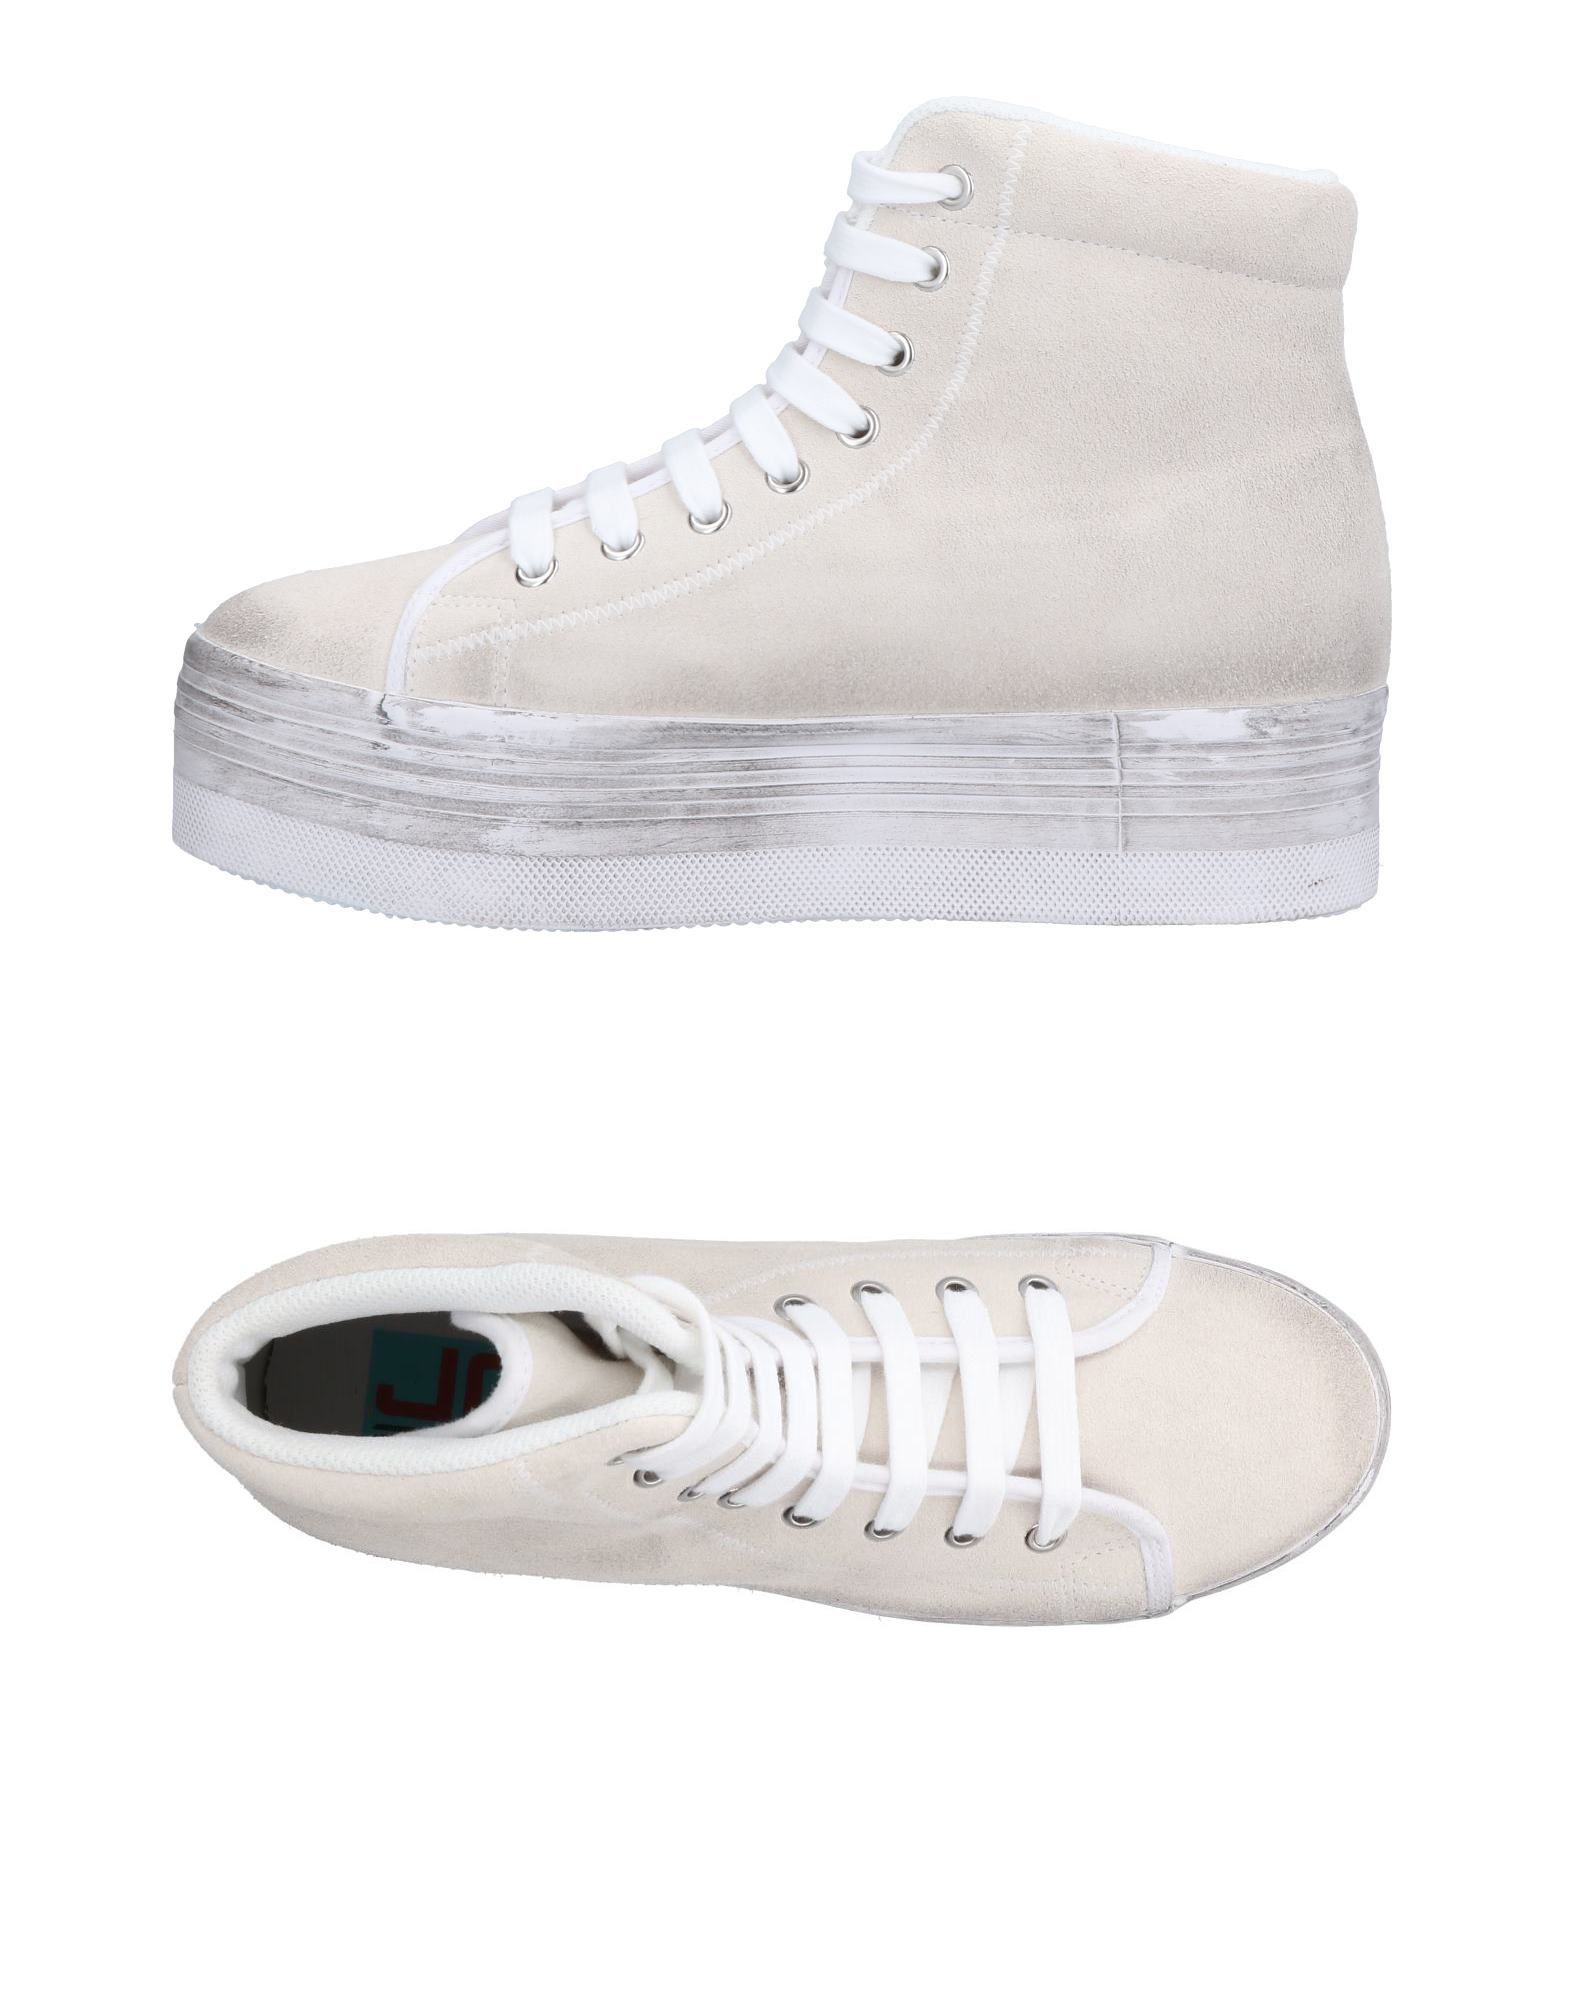 Jc Jc Jc Play By Jeffrey Campbell Sneakers - Women Jc Play By Jeffrey Campbell Sneakers online on  United Kingdom - 11126157EN 1b4e76